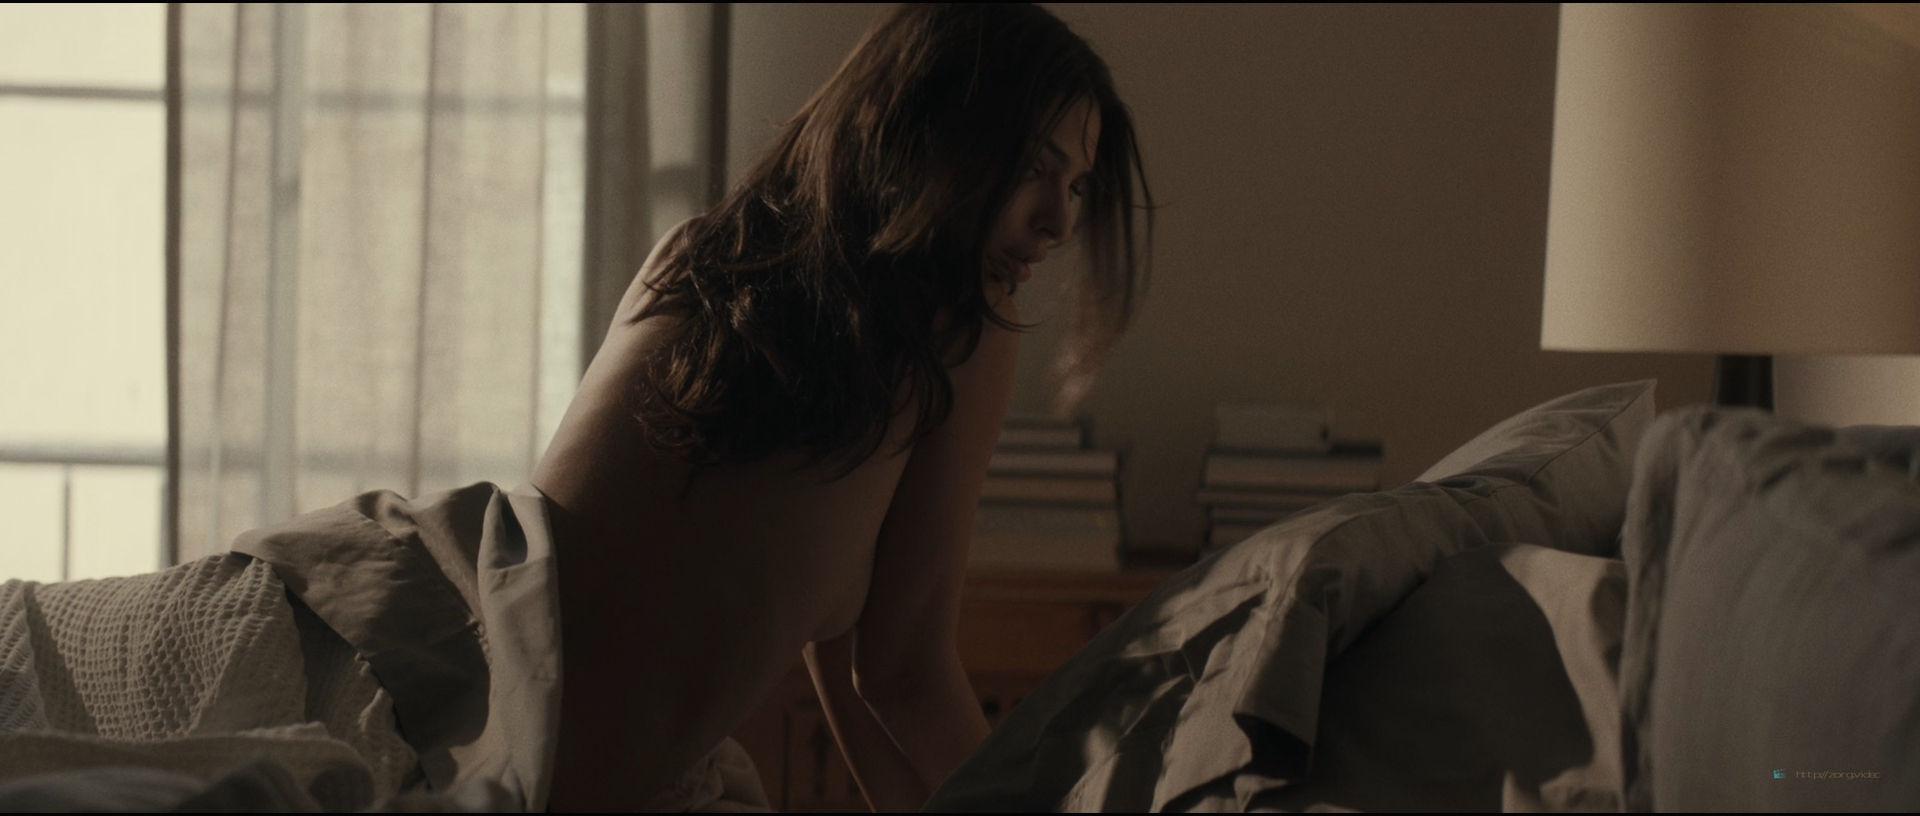 Emily Ratajkowski hot sideboob - Lying and Stealing (2019) 1080p WEB (9)